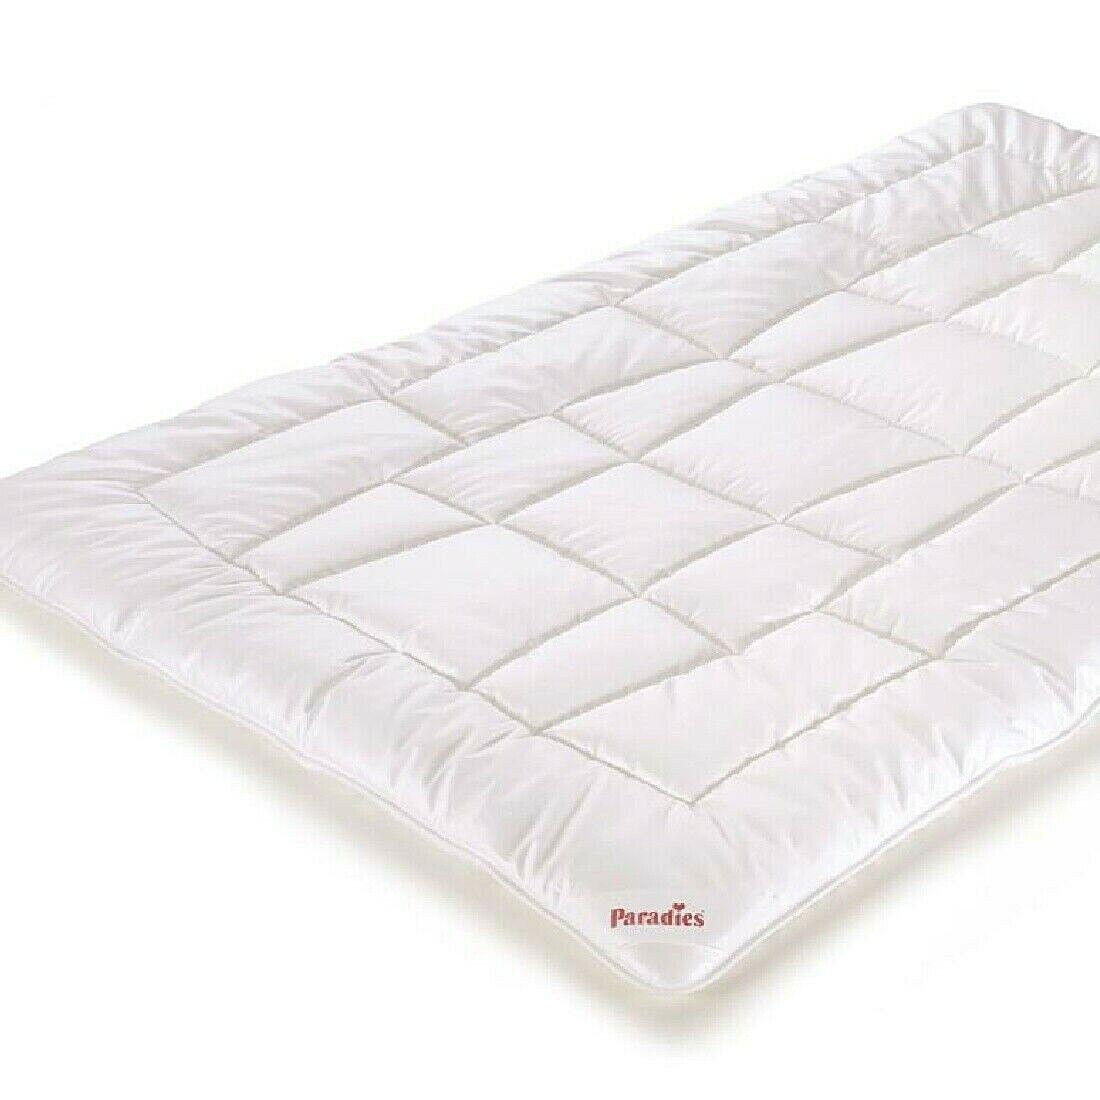 Paradise Kalea Duet Bio Organic Winter Blanket 135x200 cm Cover 100% Cotton KBA